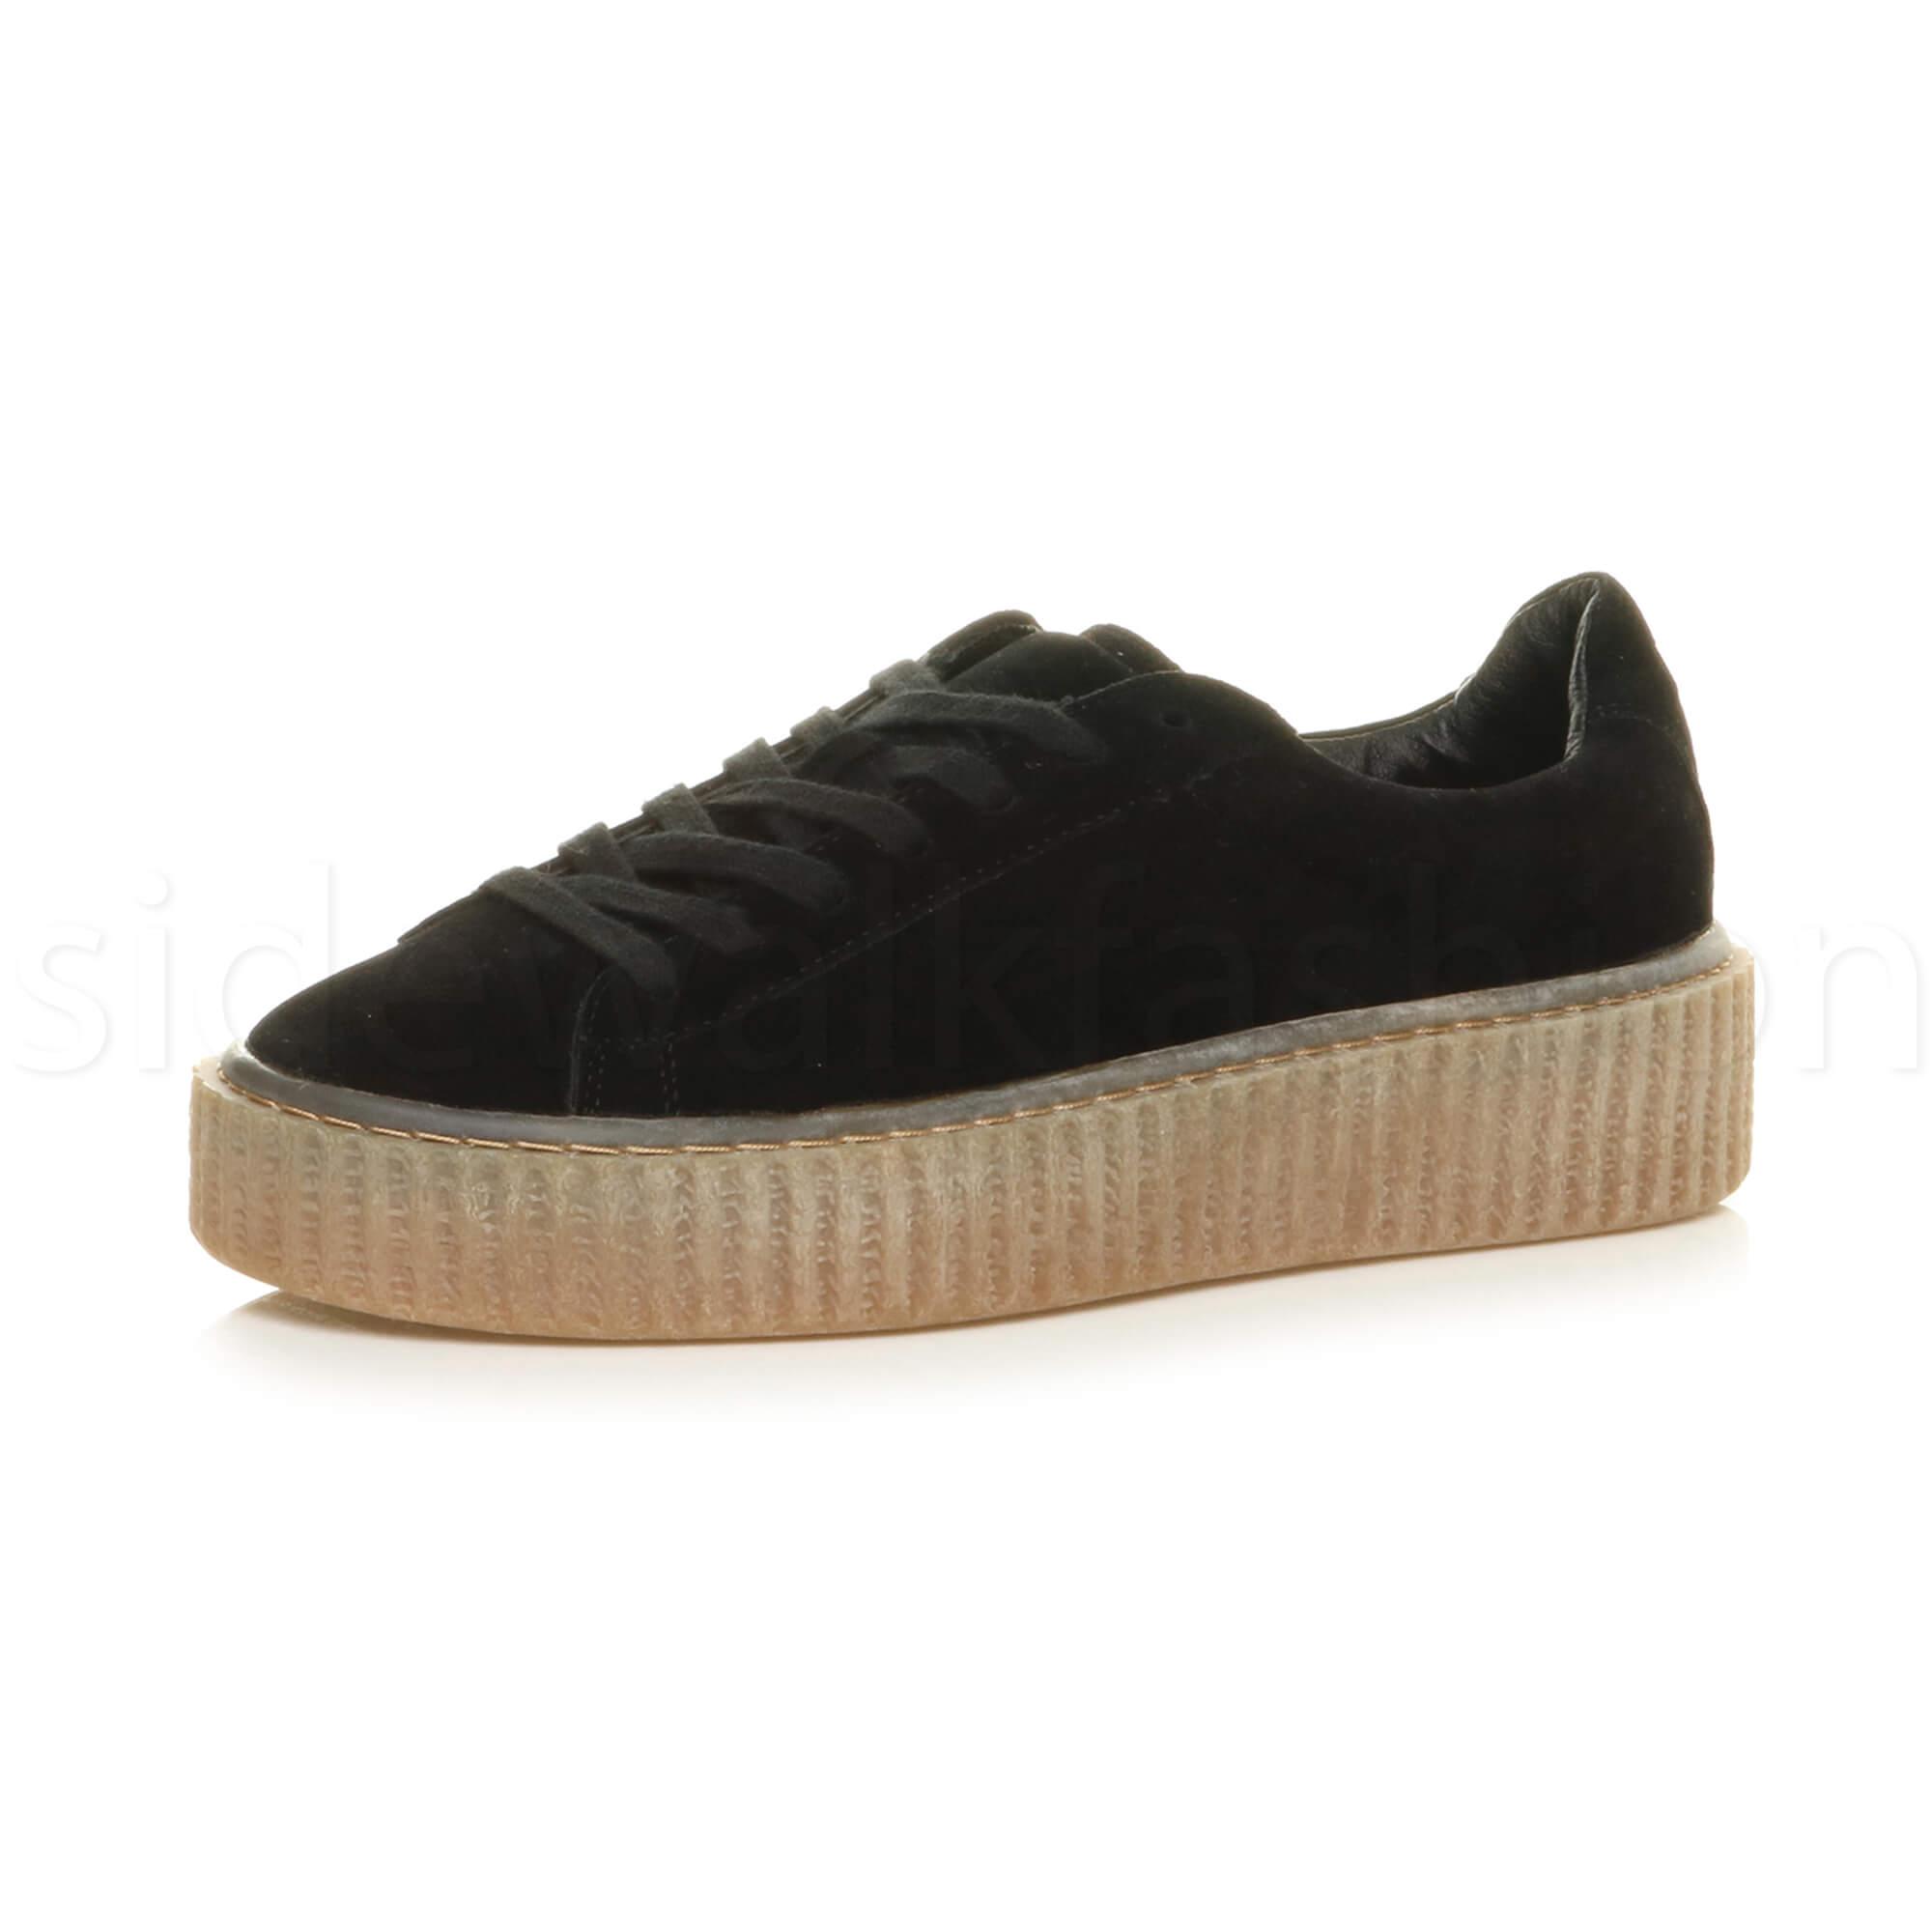 womens ladies platform flatform pom pom lace up trainer creepers shoes size ebay. Black Bedroom Furniture Sets. Home Design Ideas